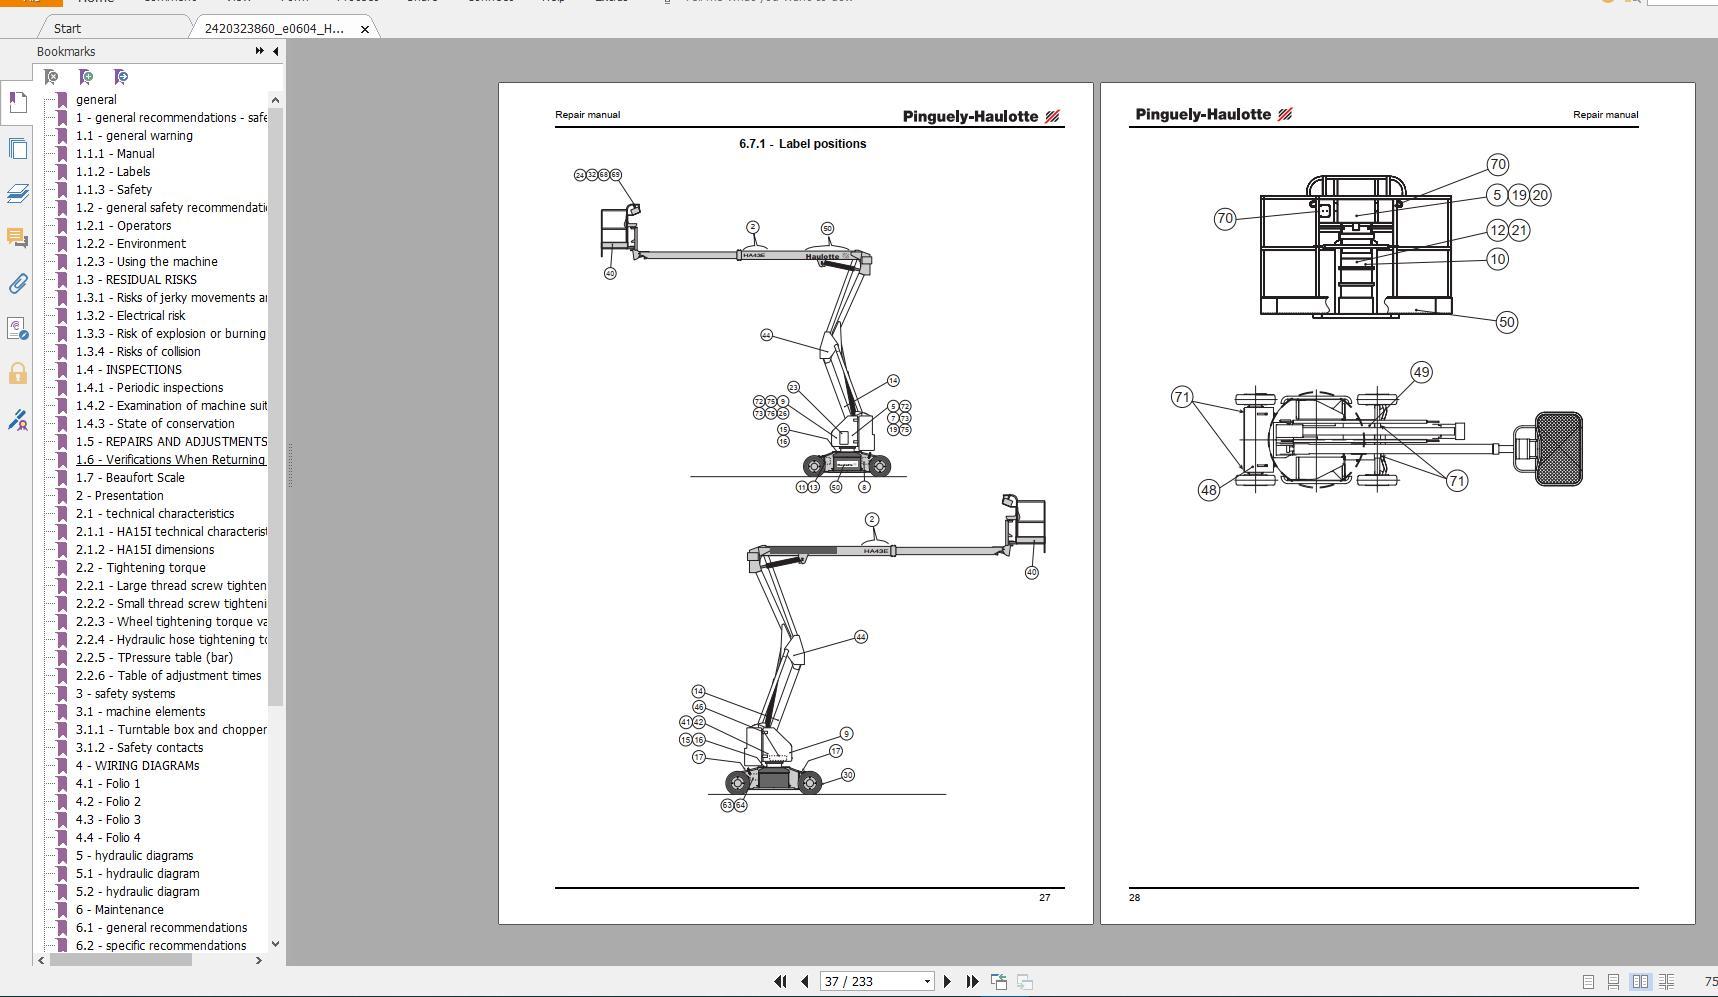 Haulotte_Work_Platforms_and_Telehandlers_Service_Maintenance_Operators_Manual_Training_Spare_Parts_Manual_DVD19